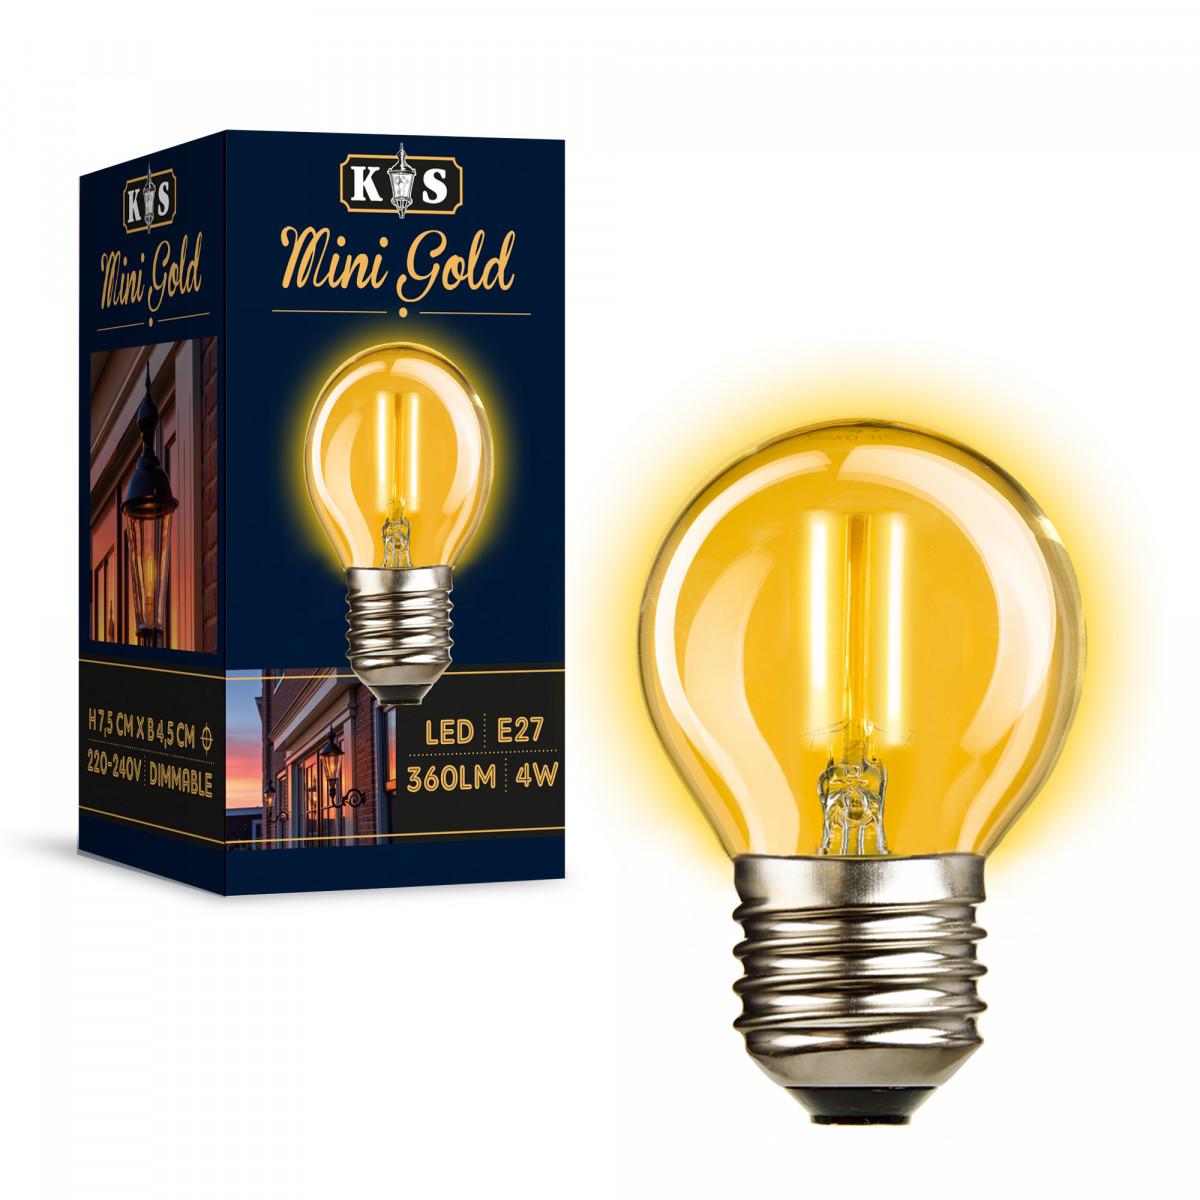 LED Lamp Mini Gold 4W